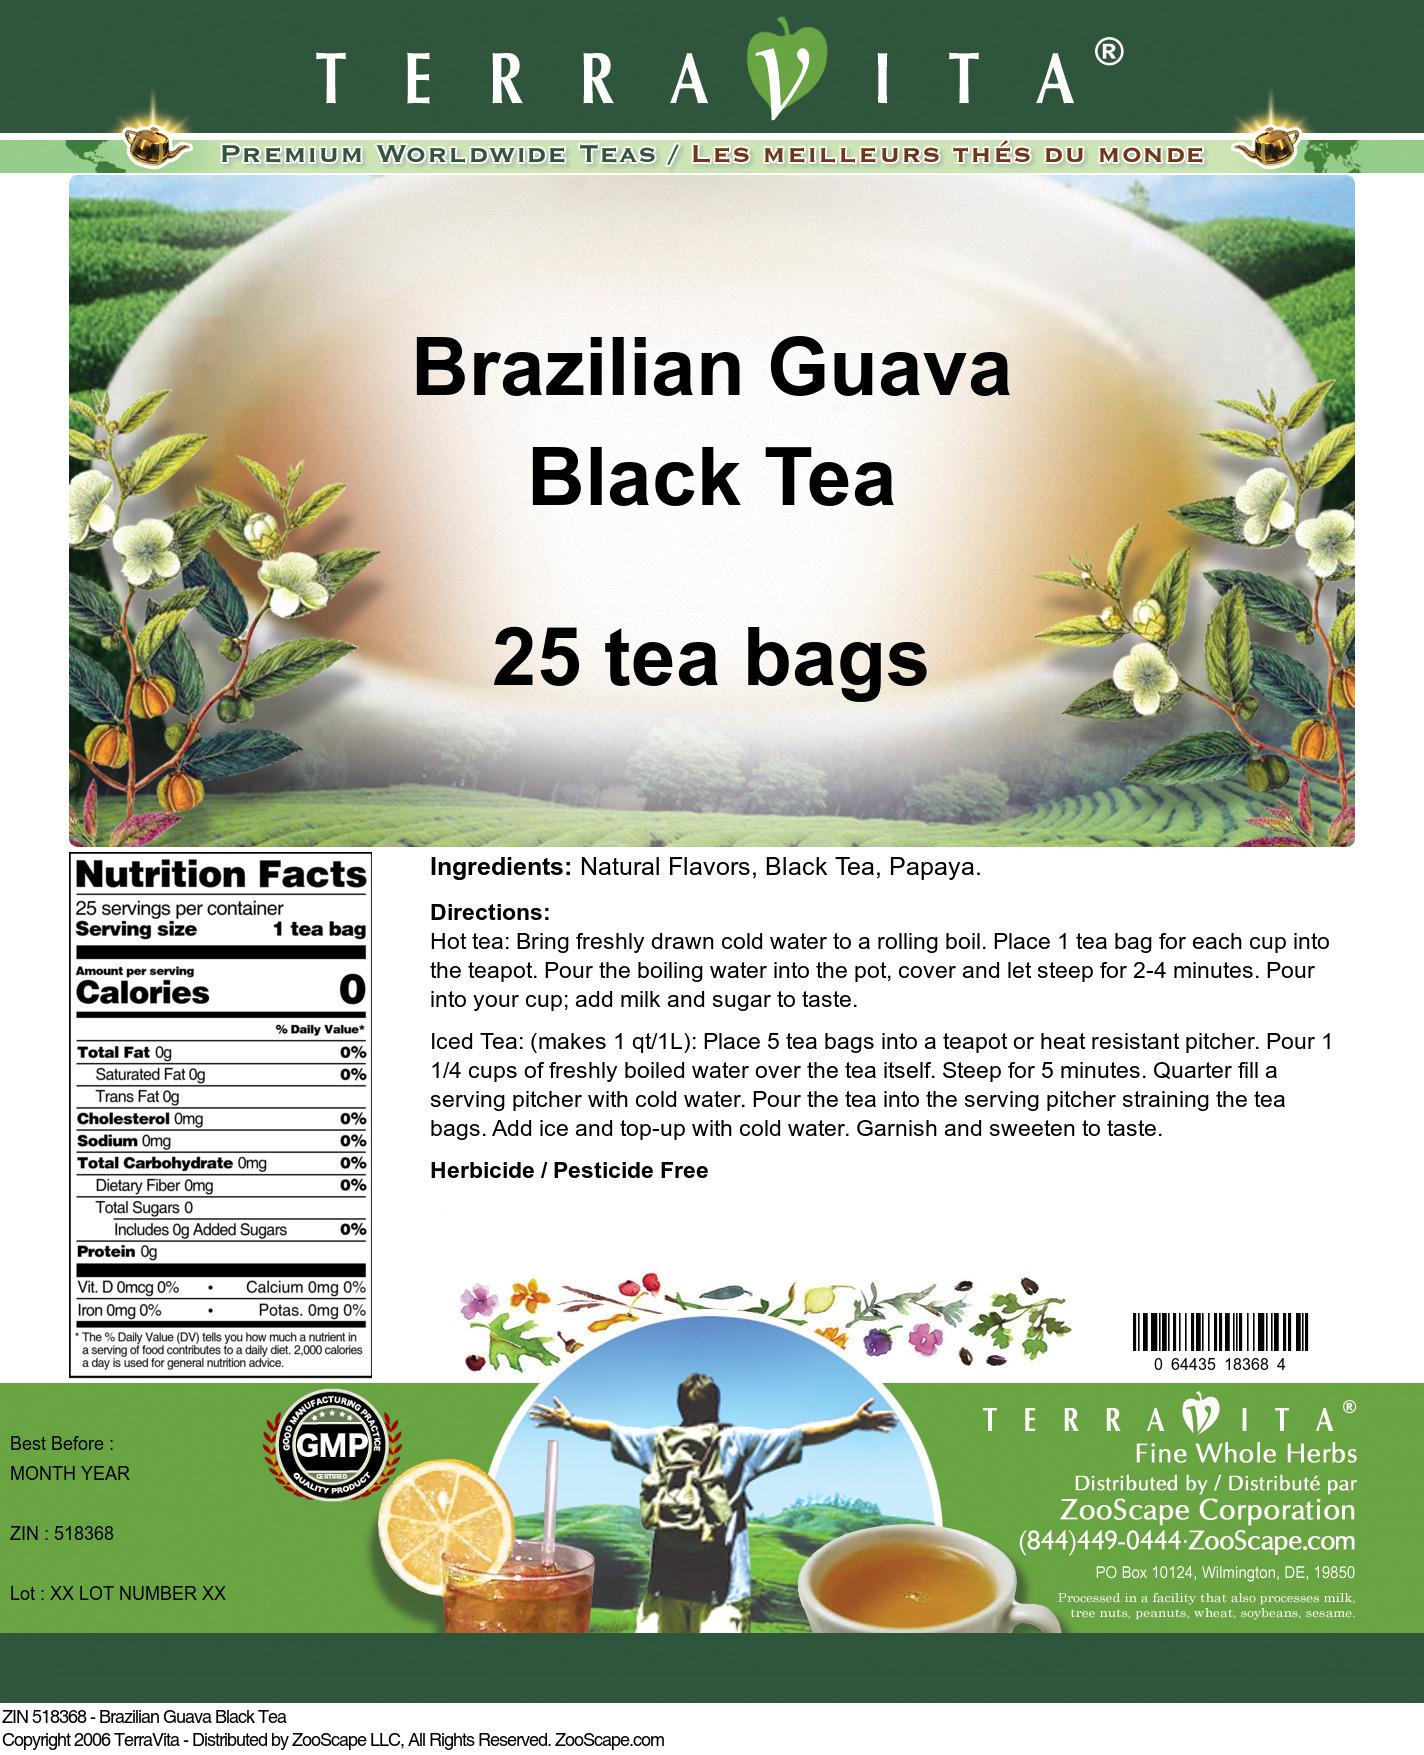 Brazilian Guava Black Tea